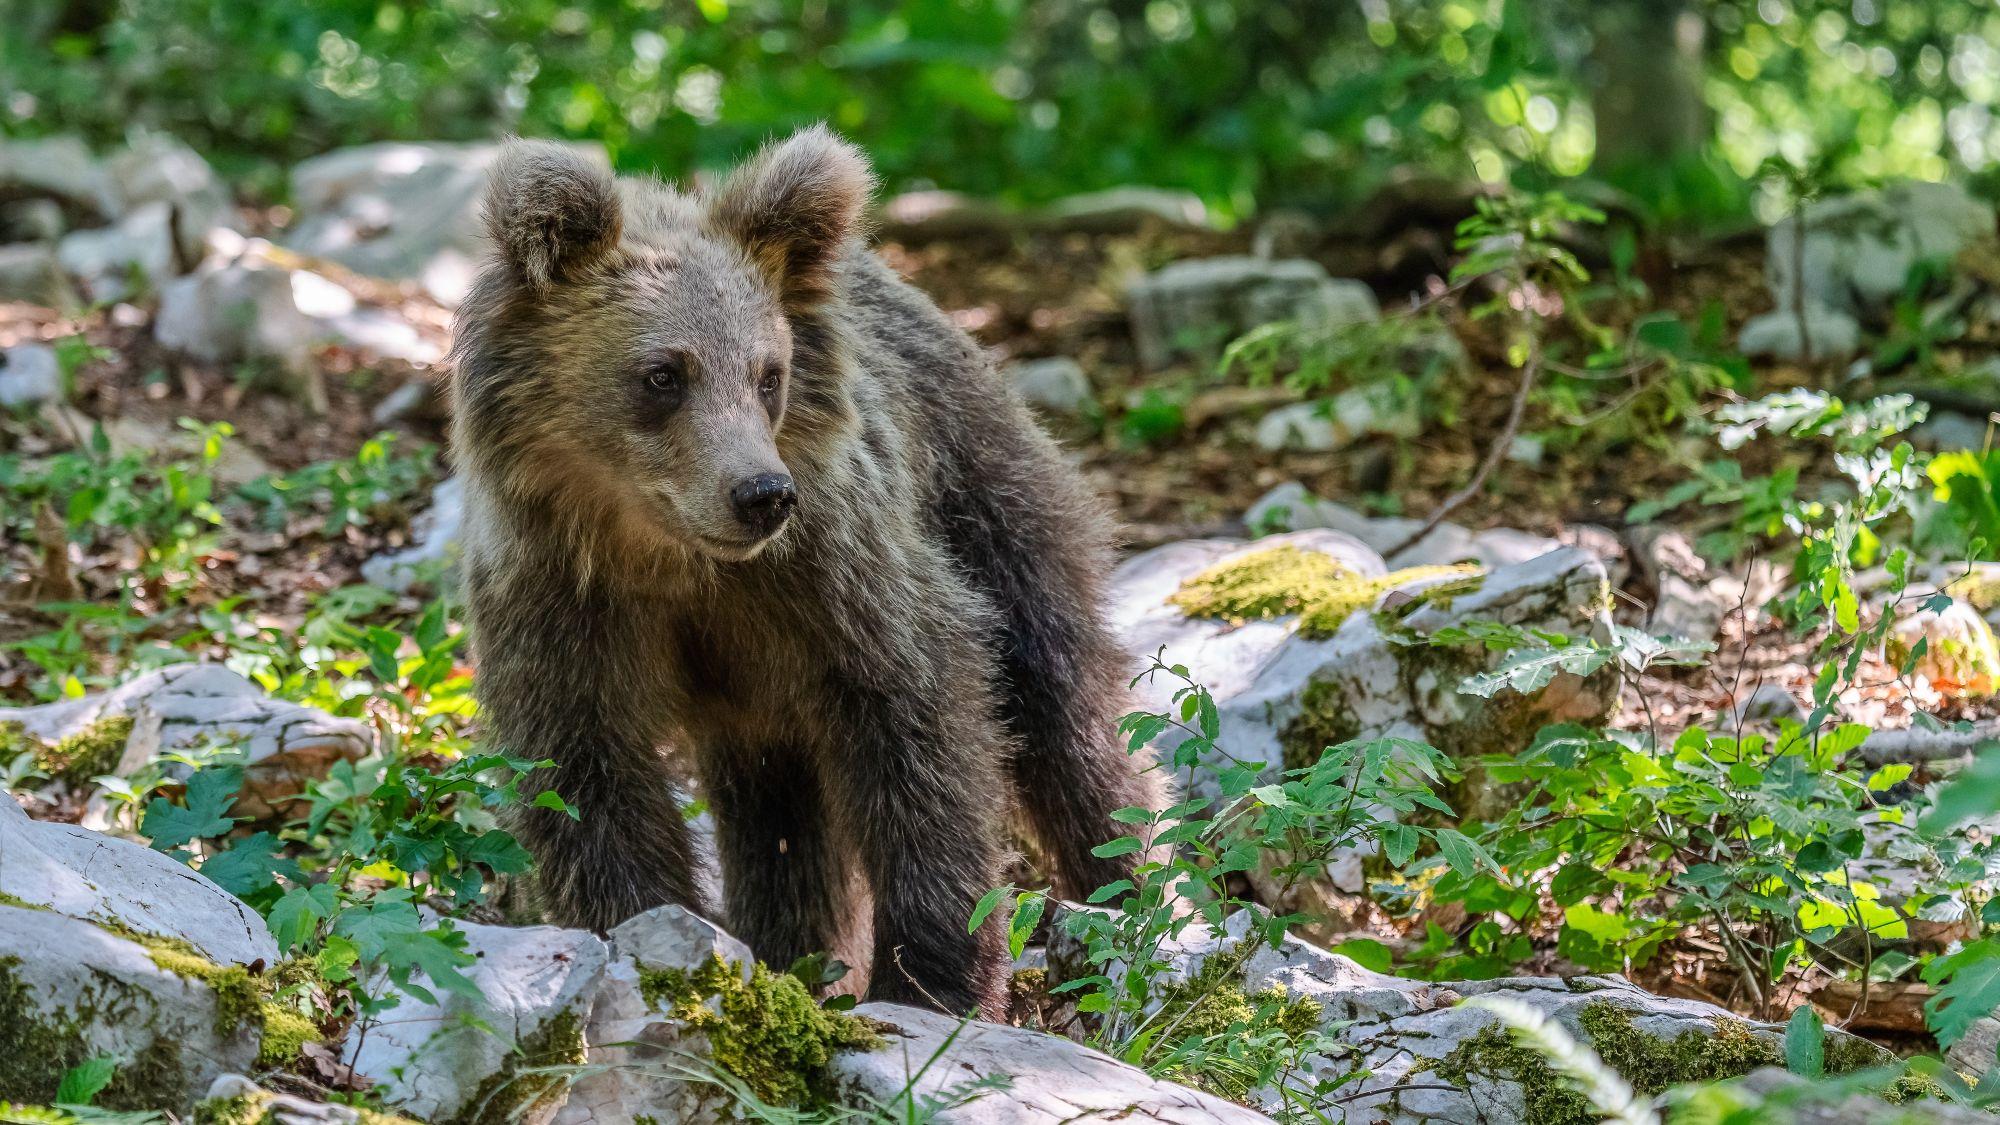 !!! Andreas Hütten Entering the bears' realm O/ - Andreas Hütten - bear cub